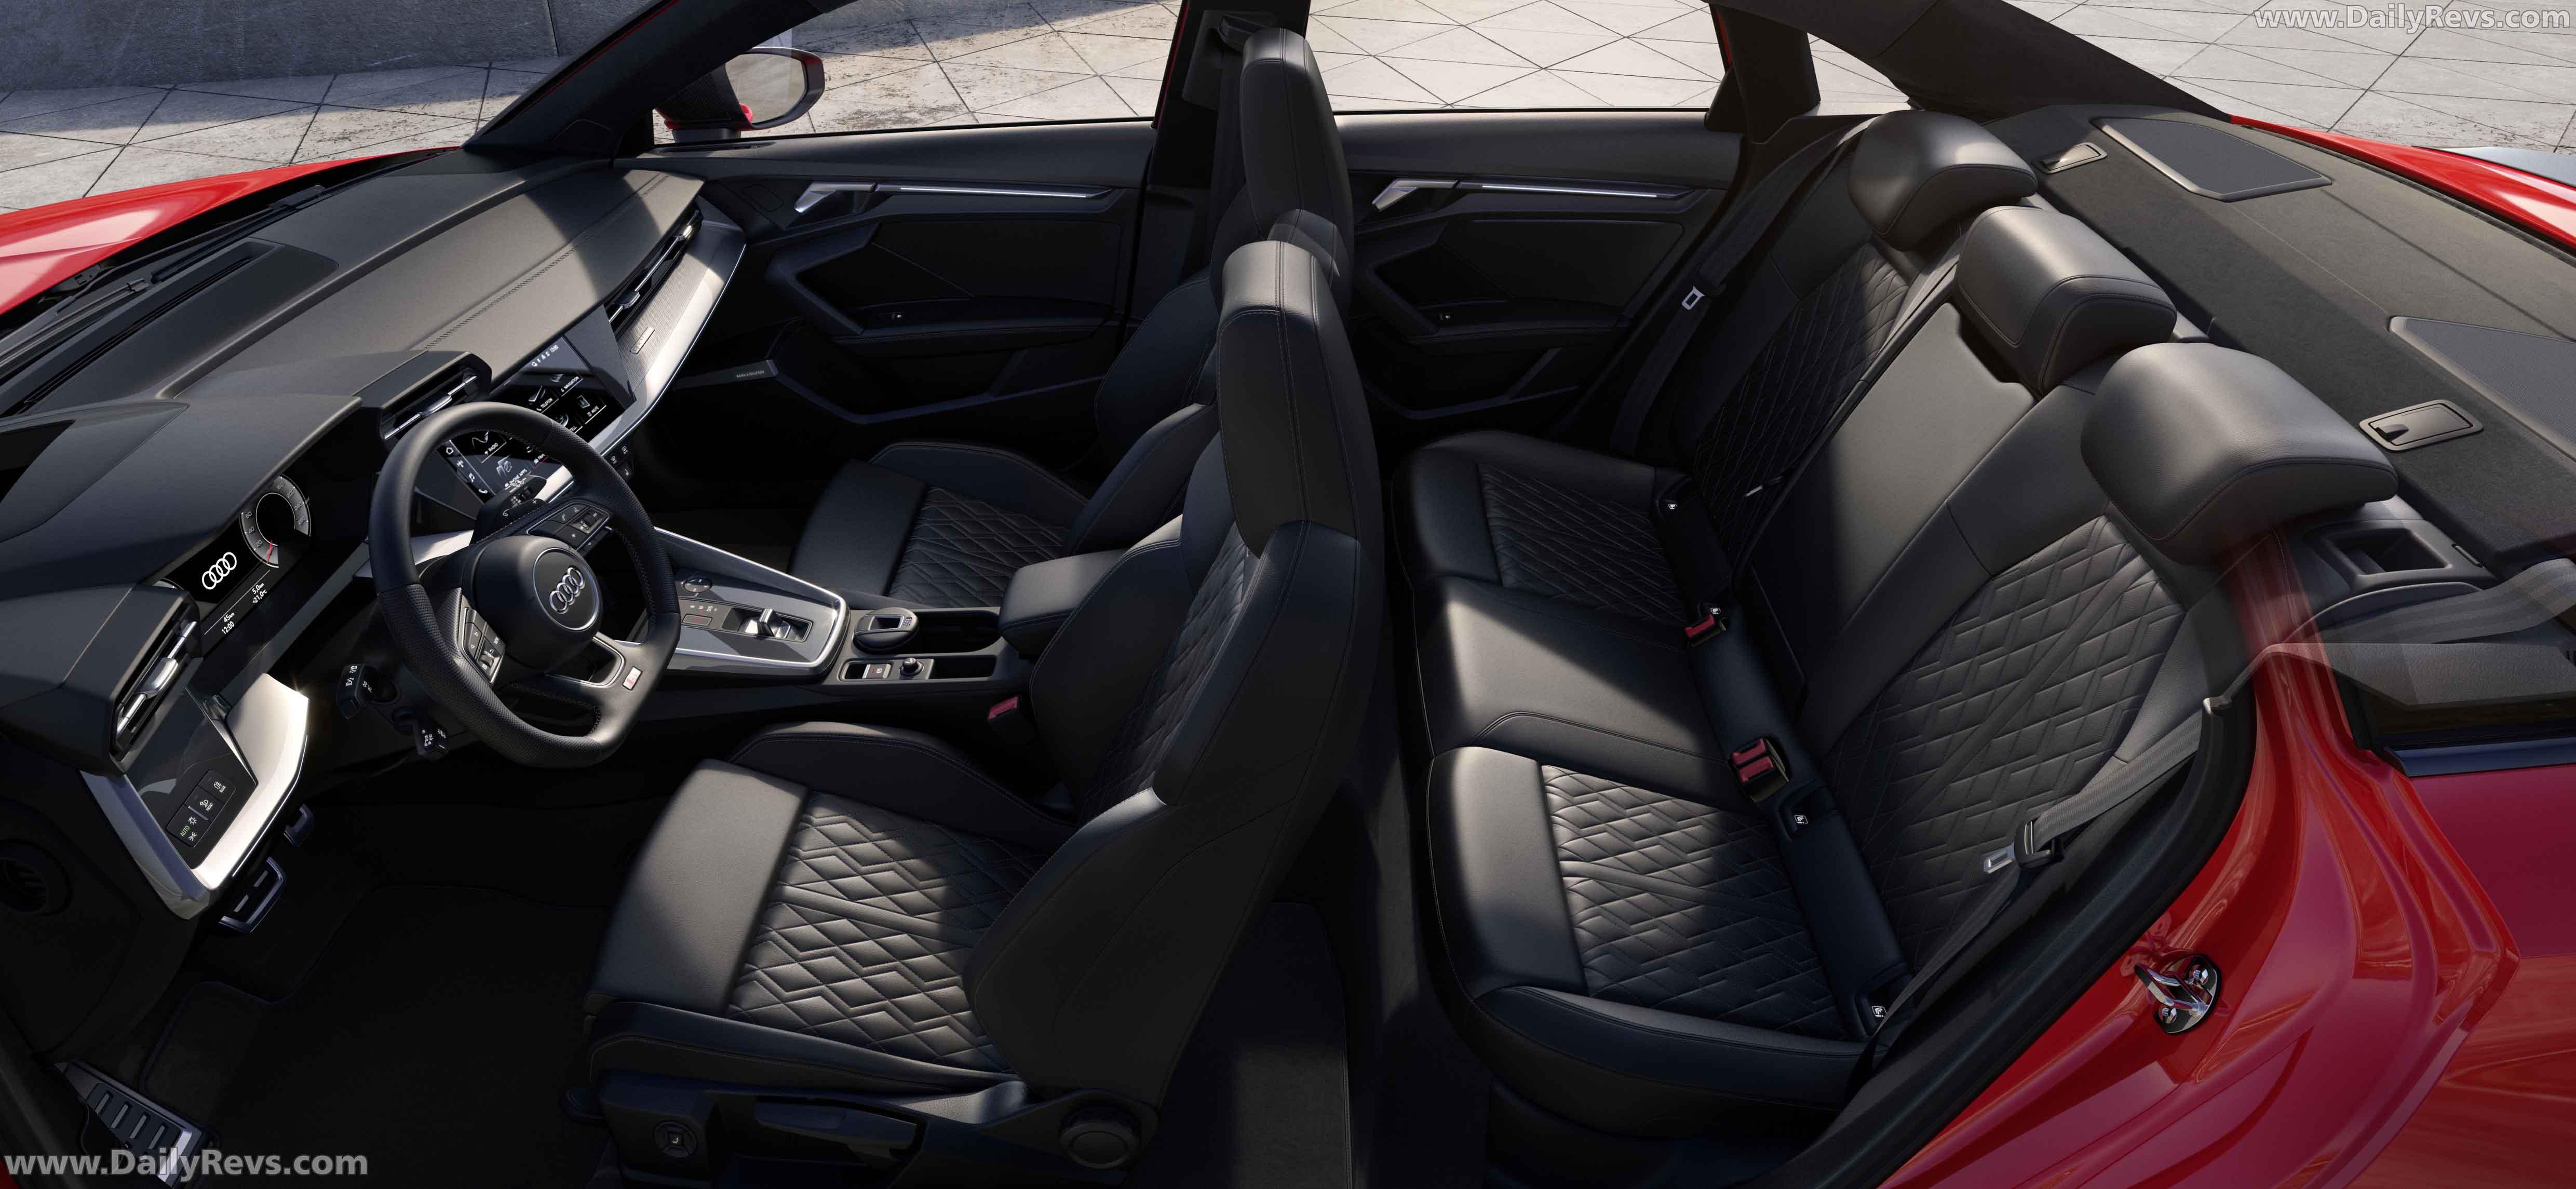 2021 Audi S3 Sedan - Dailyrevs